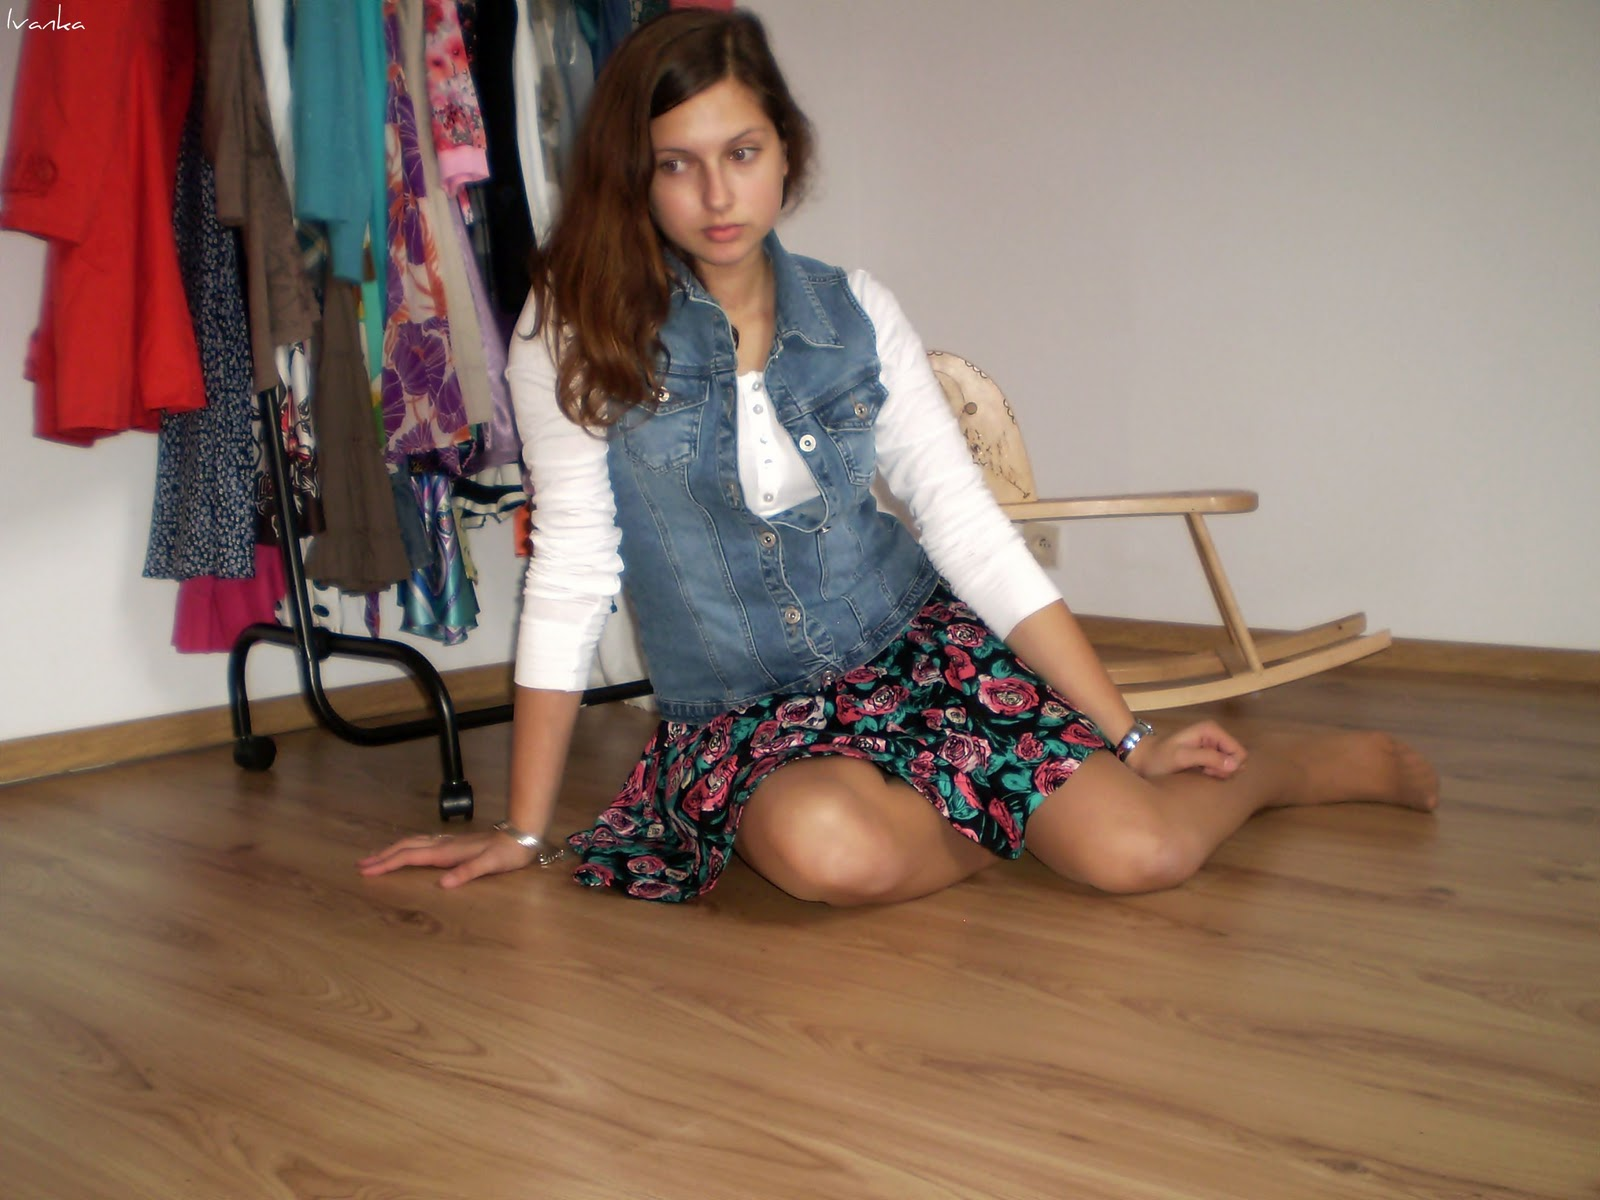 fabulous dressed blogger woman: Ivanka from Slovakia